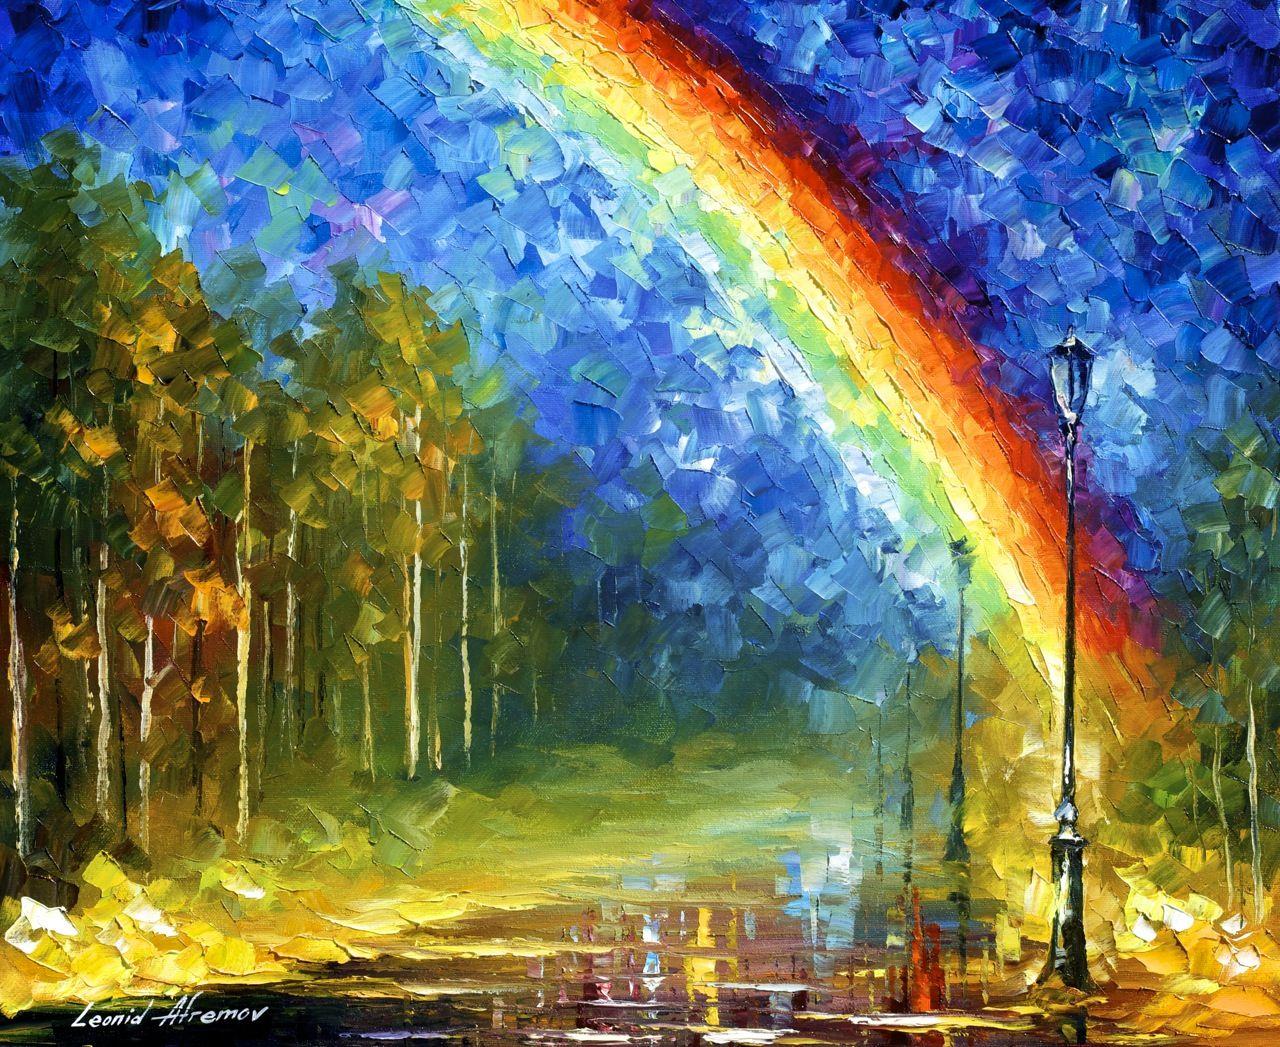 Rainbow landscape original oil pastel drawing - Rainbow Palette Knife Oil Painting On Canvas By Leonid Afremov By Leonid Afremov